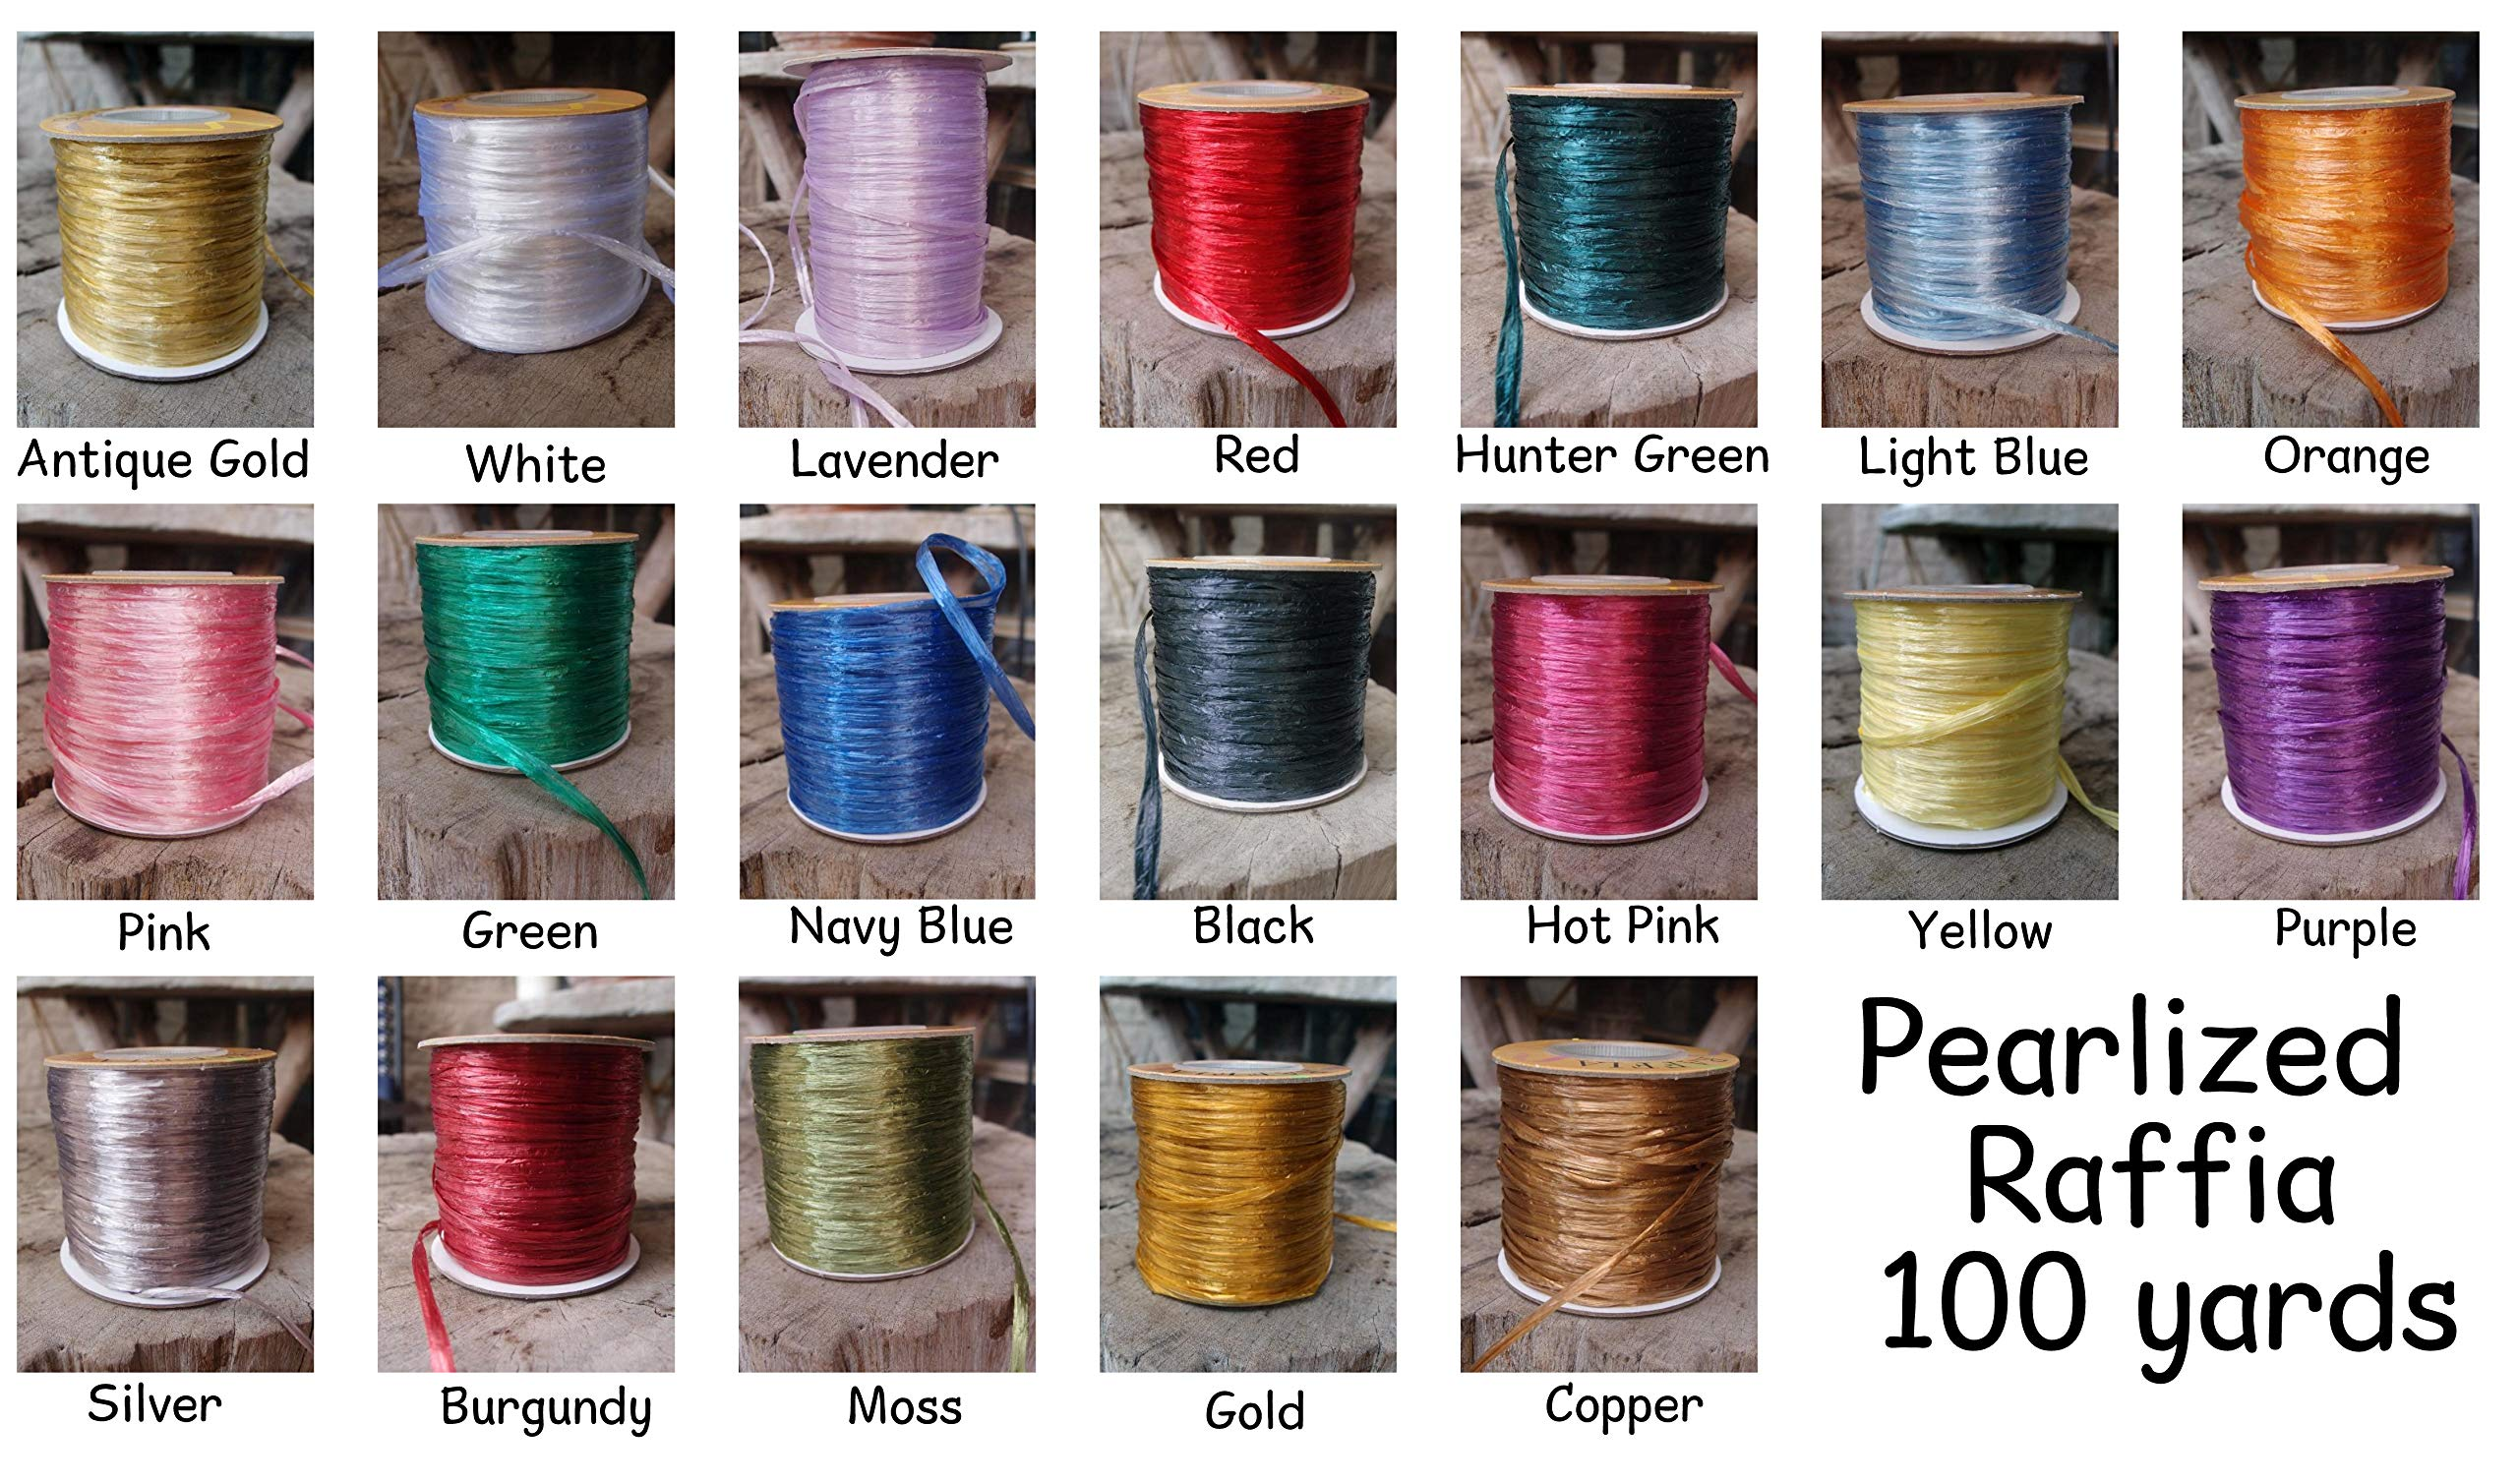 PoshNPretty Pearlized Synthetic Raffia Roll 100 Yards - Choose Colors (Antique Gold) by POSH N PRETTY